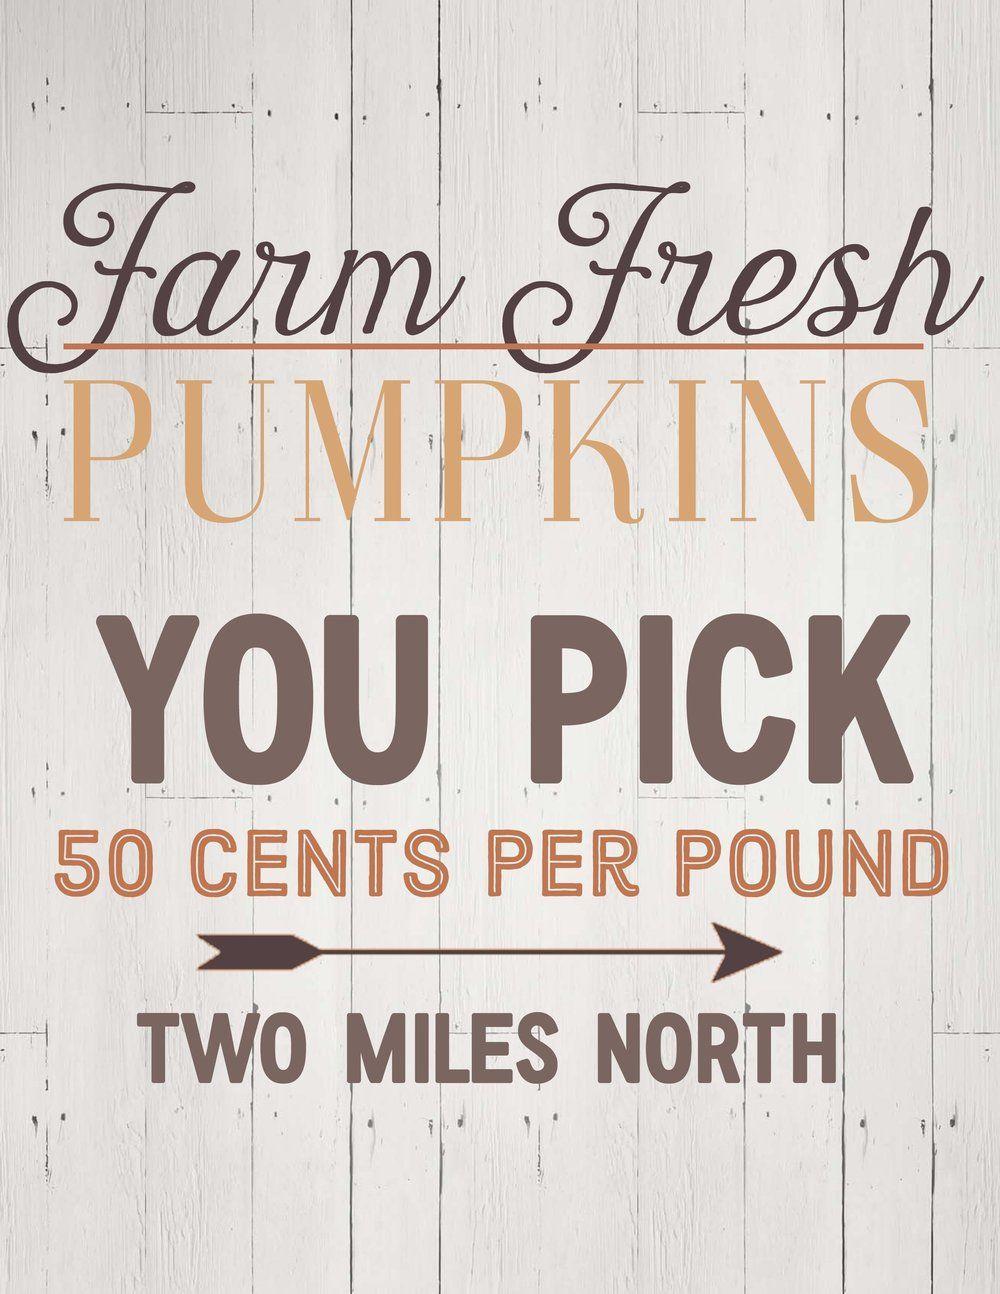 Free Fall Farmhouse Printables Farmhouse Fall Farmhouse Printables Free Fall Printables